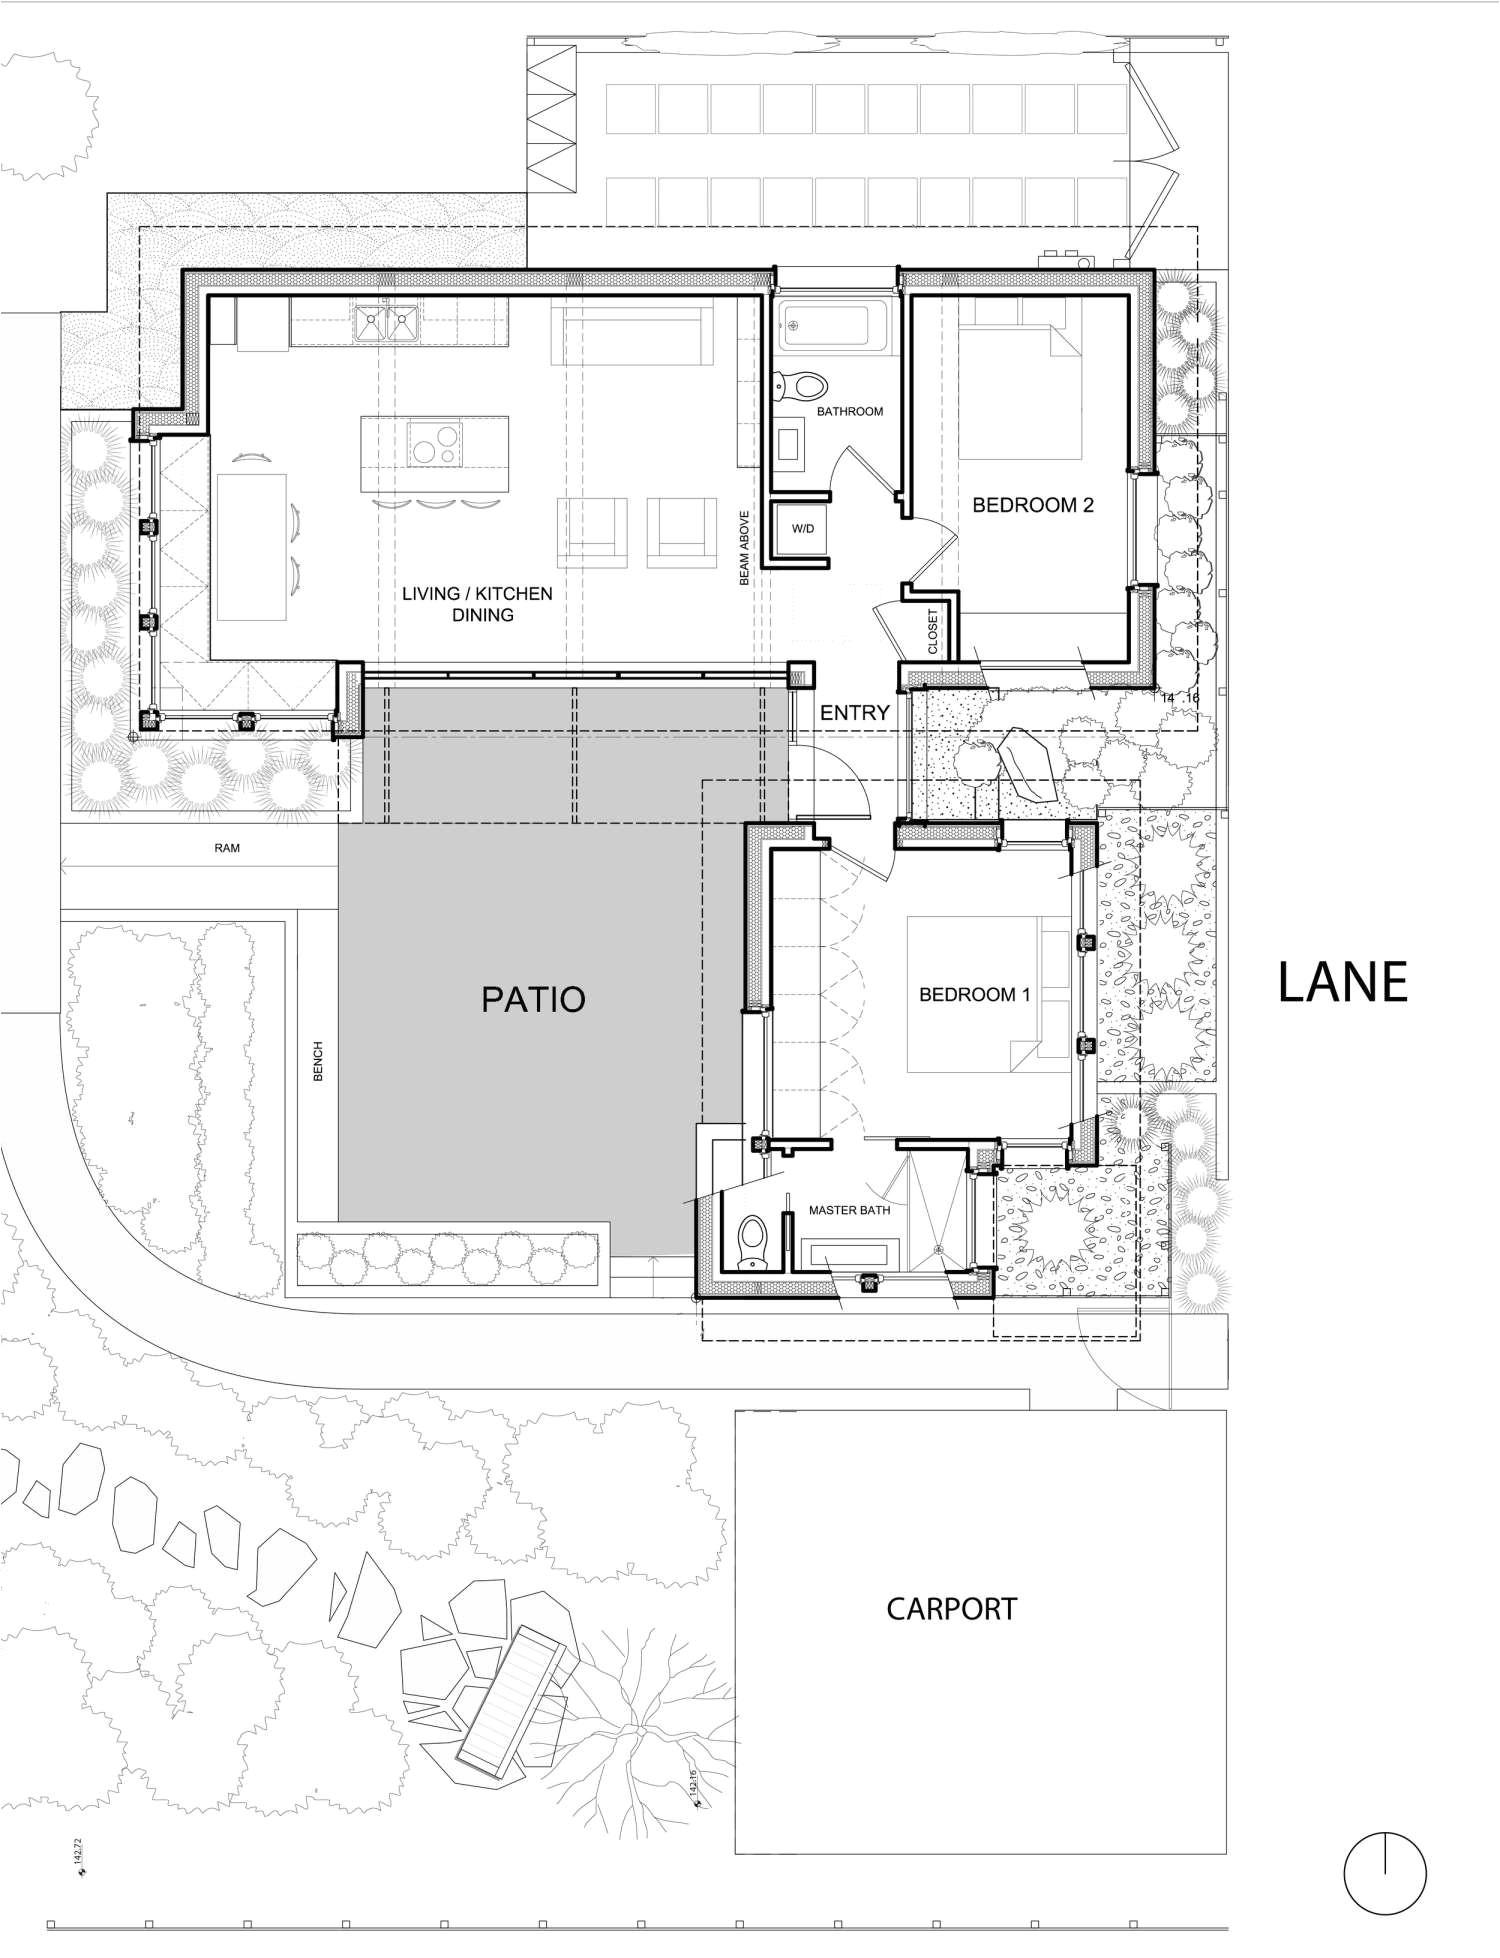 lanefab two birds laneway house floor plan via smallhousebliss